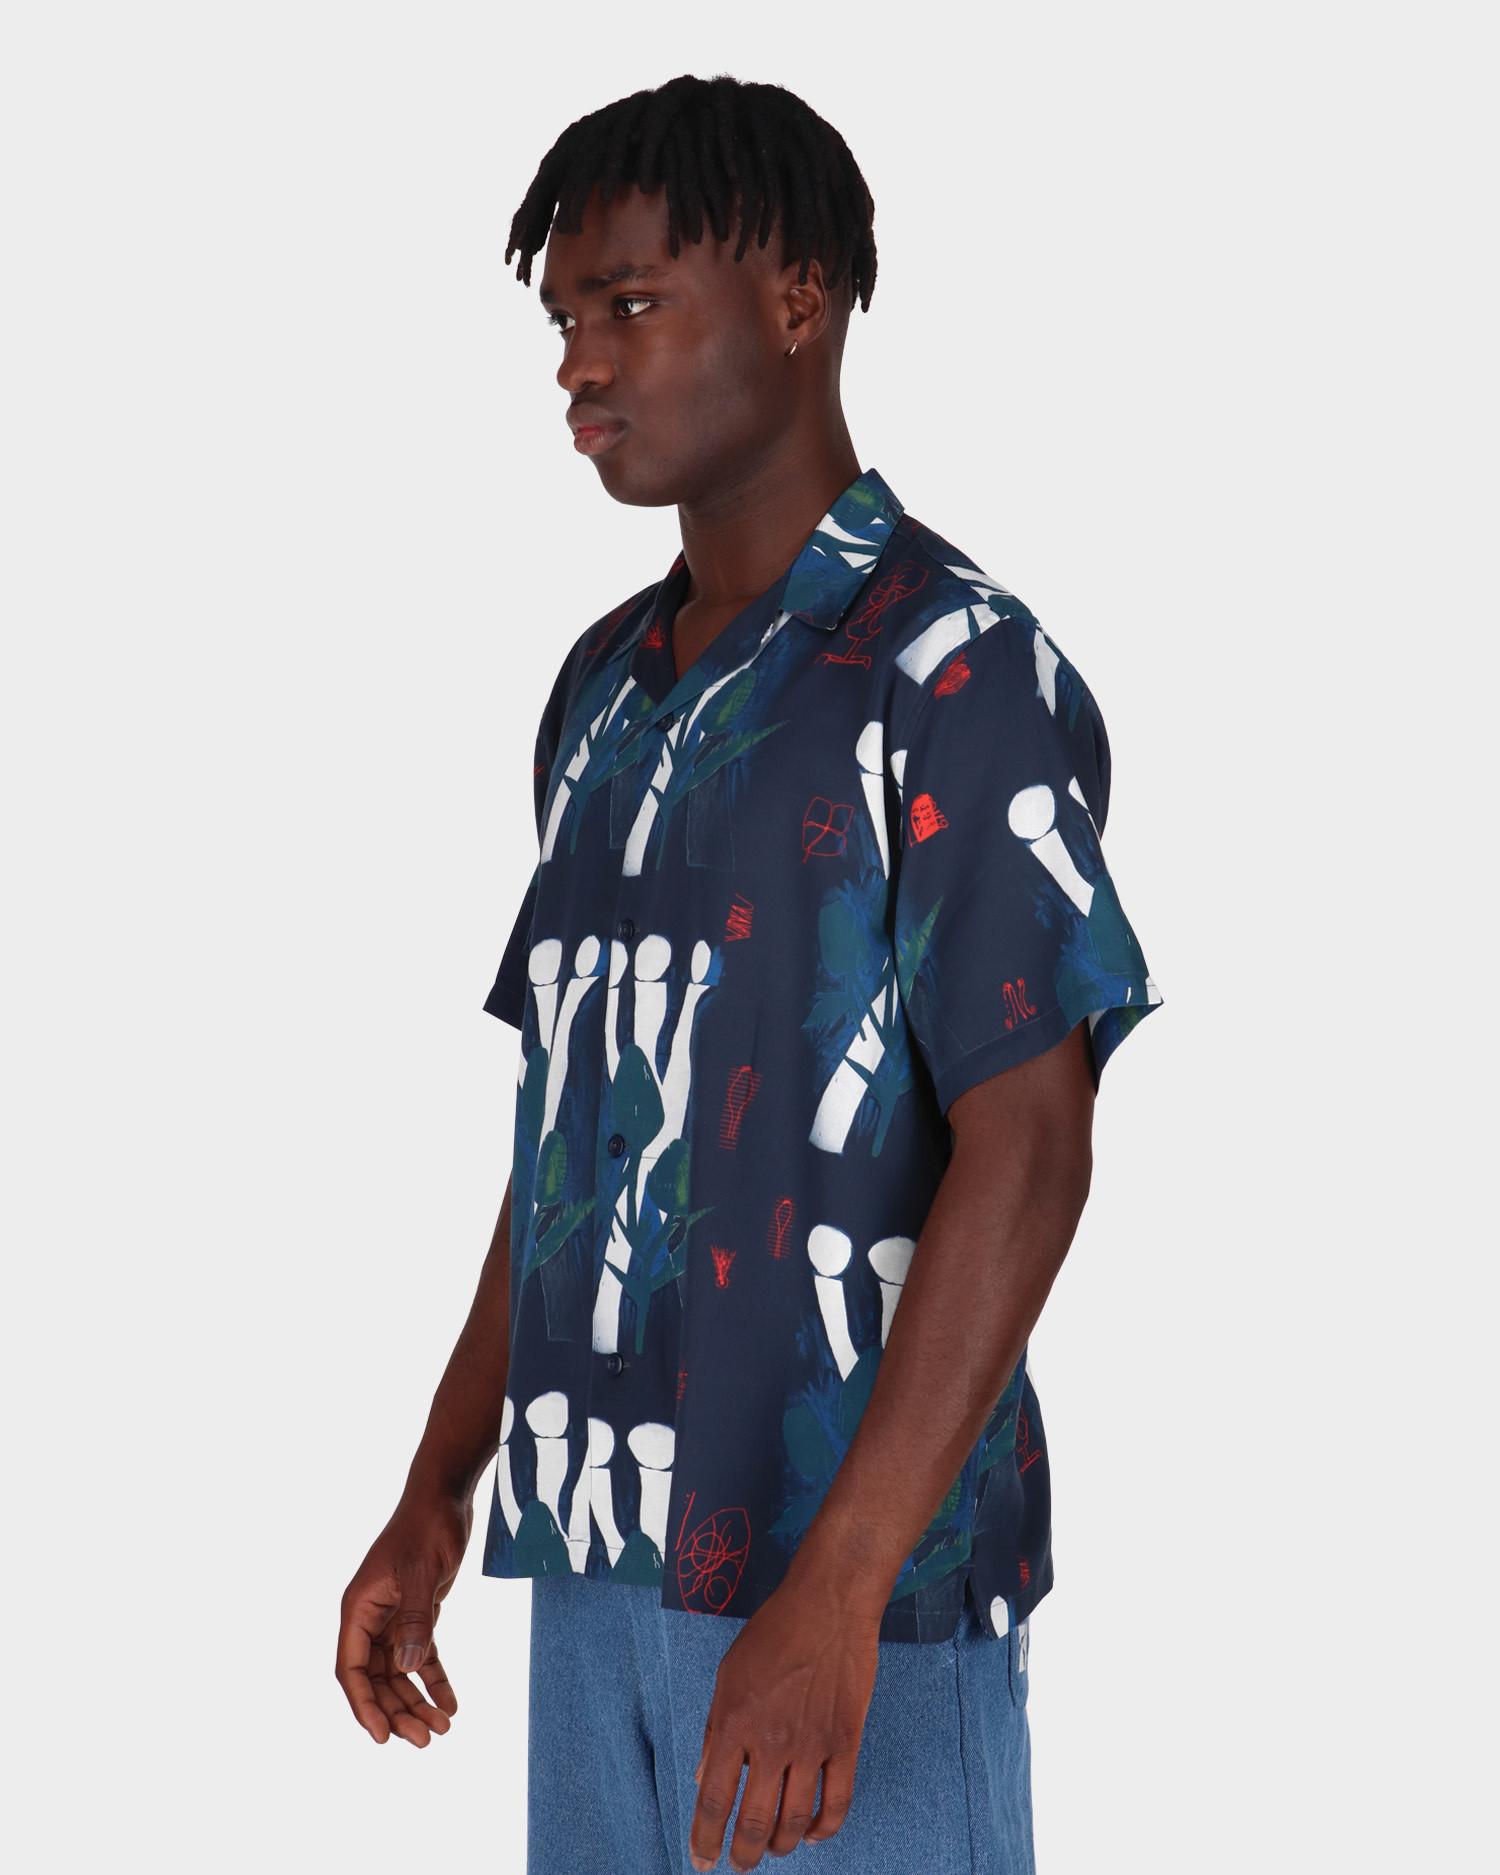 Carhartt Tom Krol Sauce Shortsleeve Shirt Flower Print